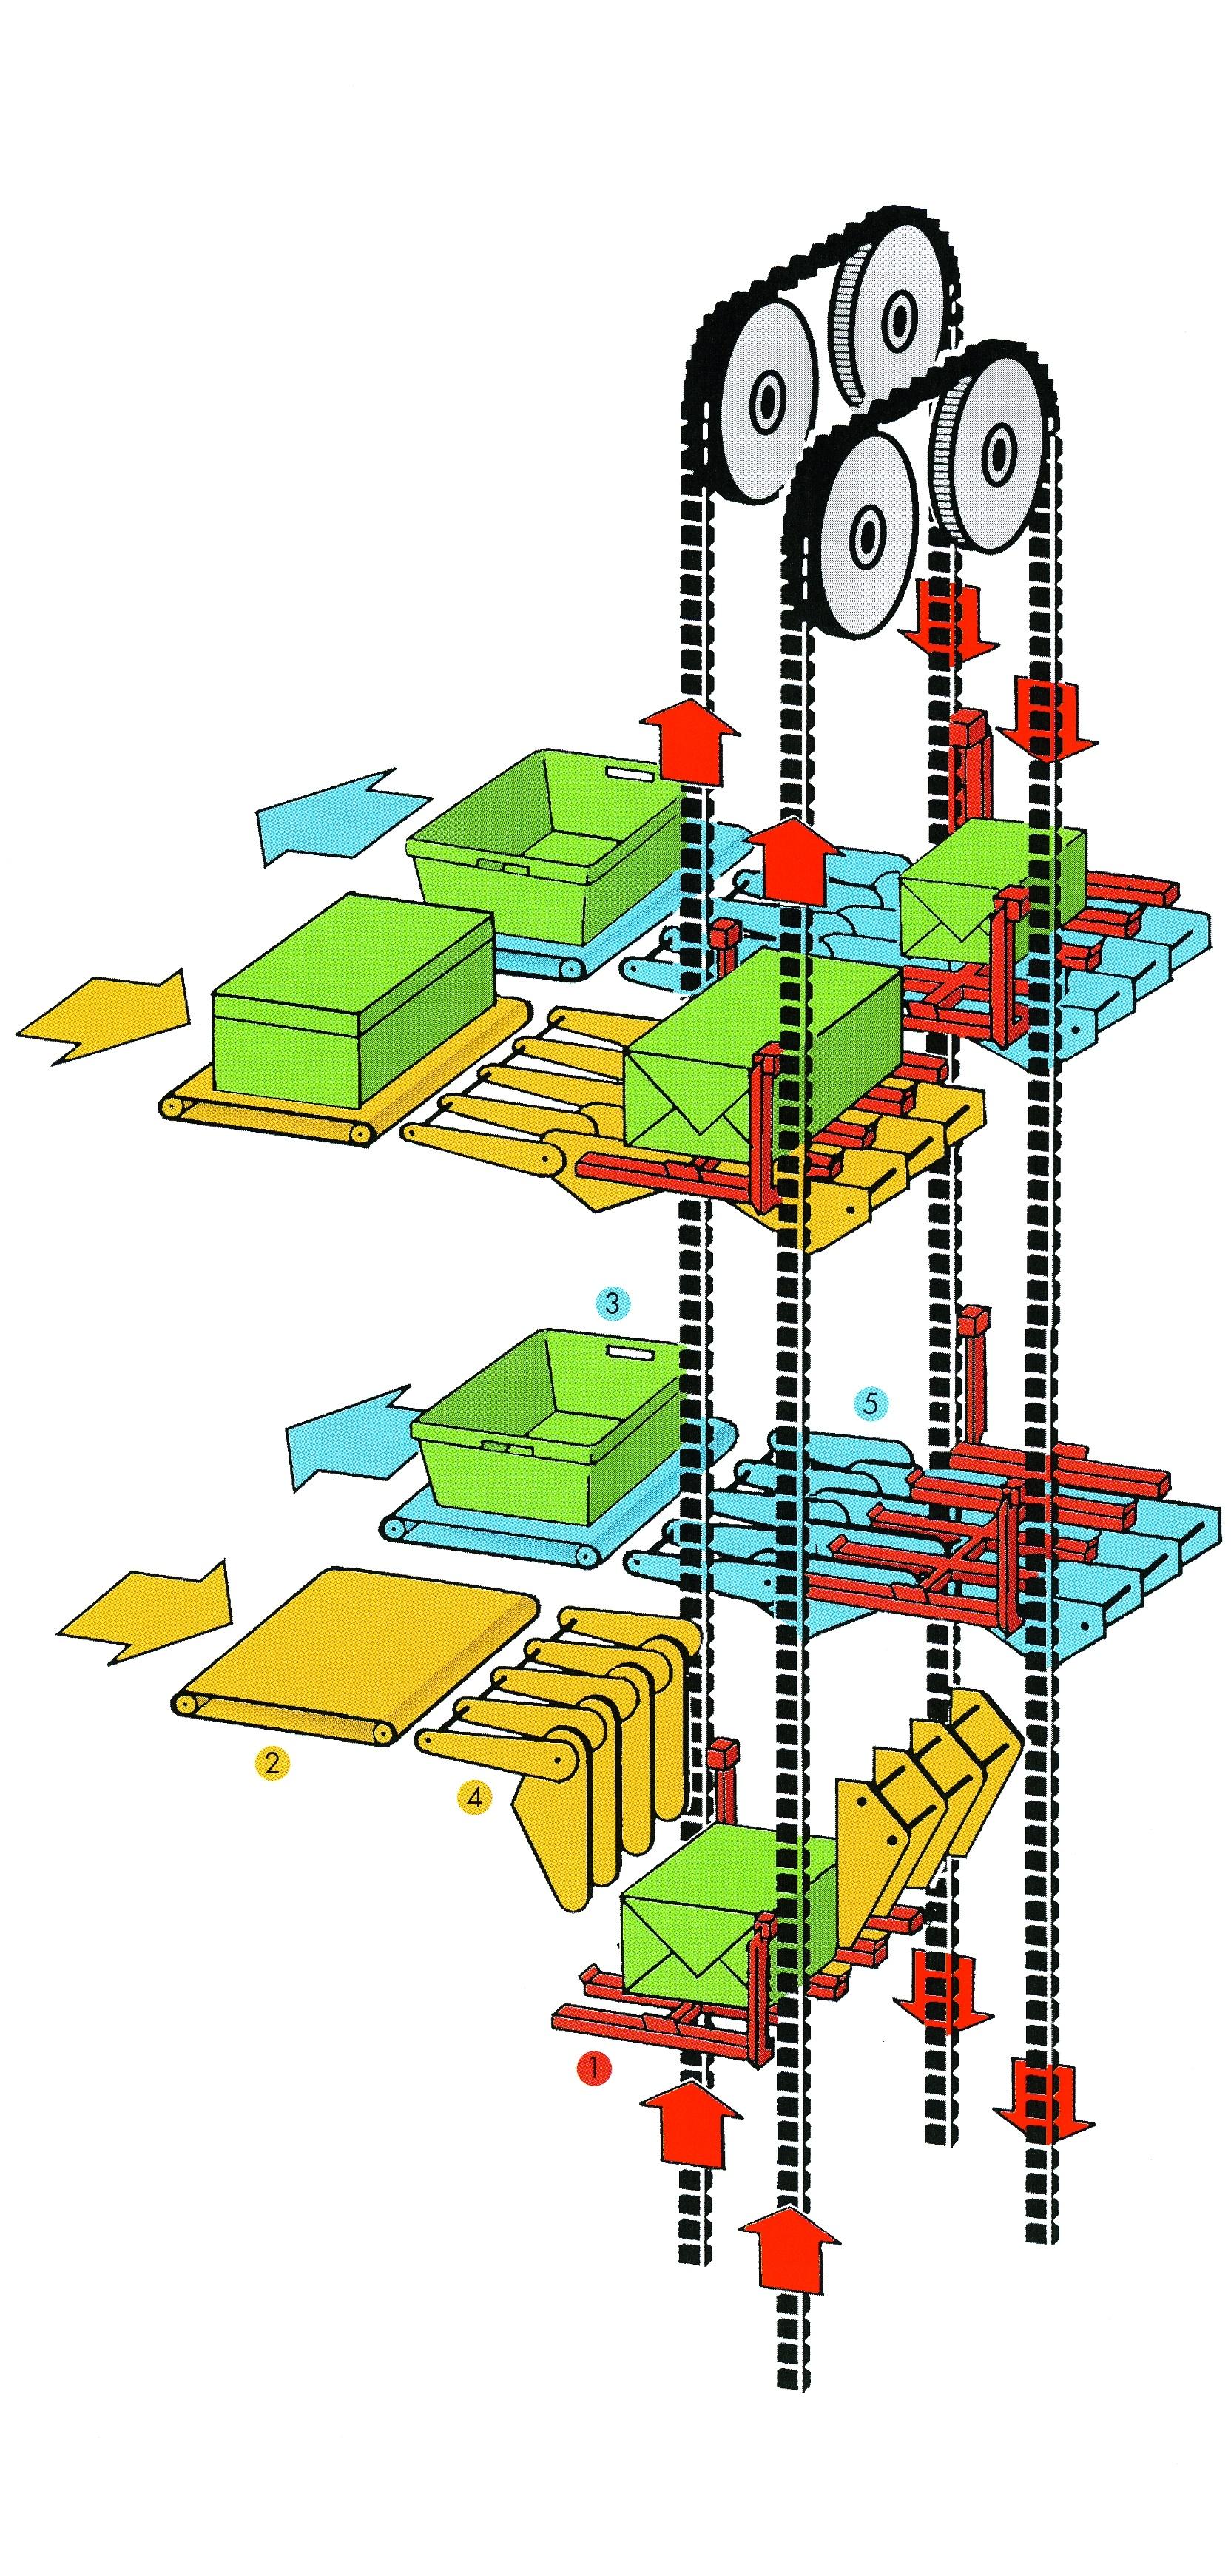 Circulating Conveyors For Distribution Applications